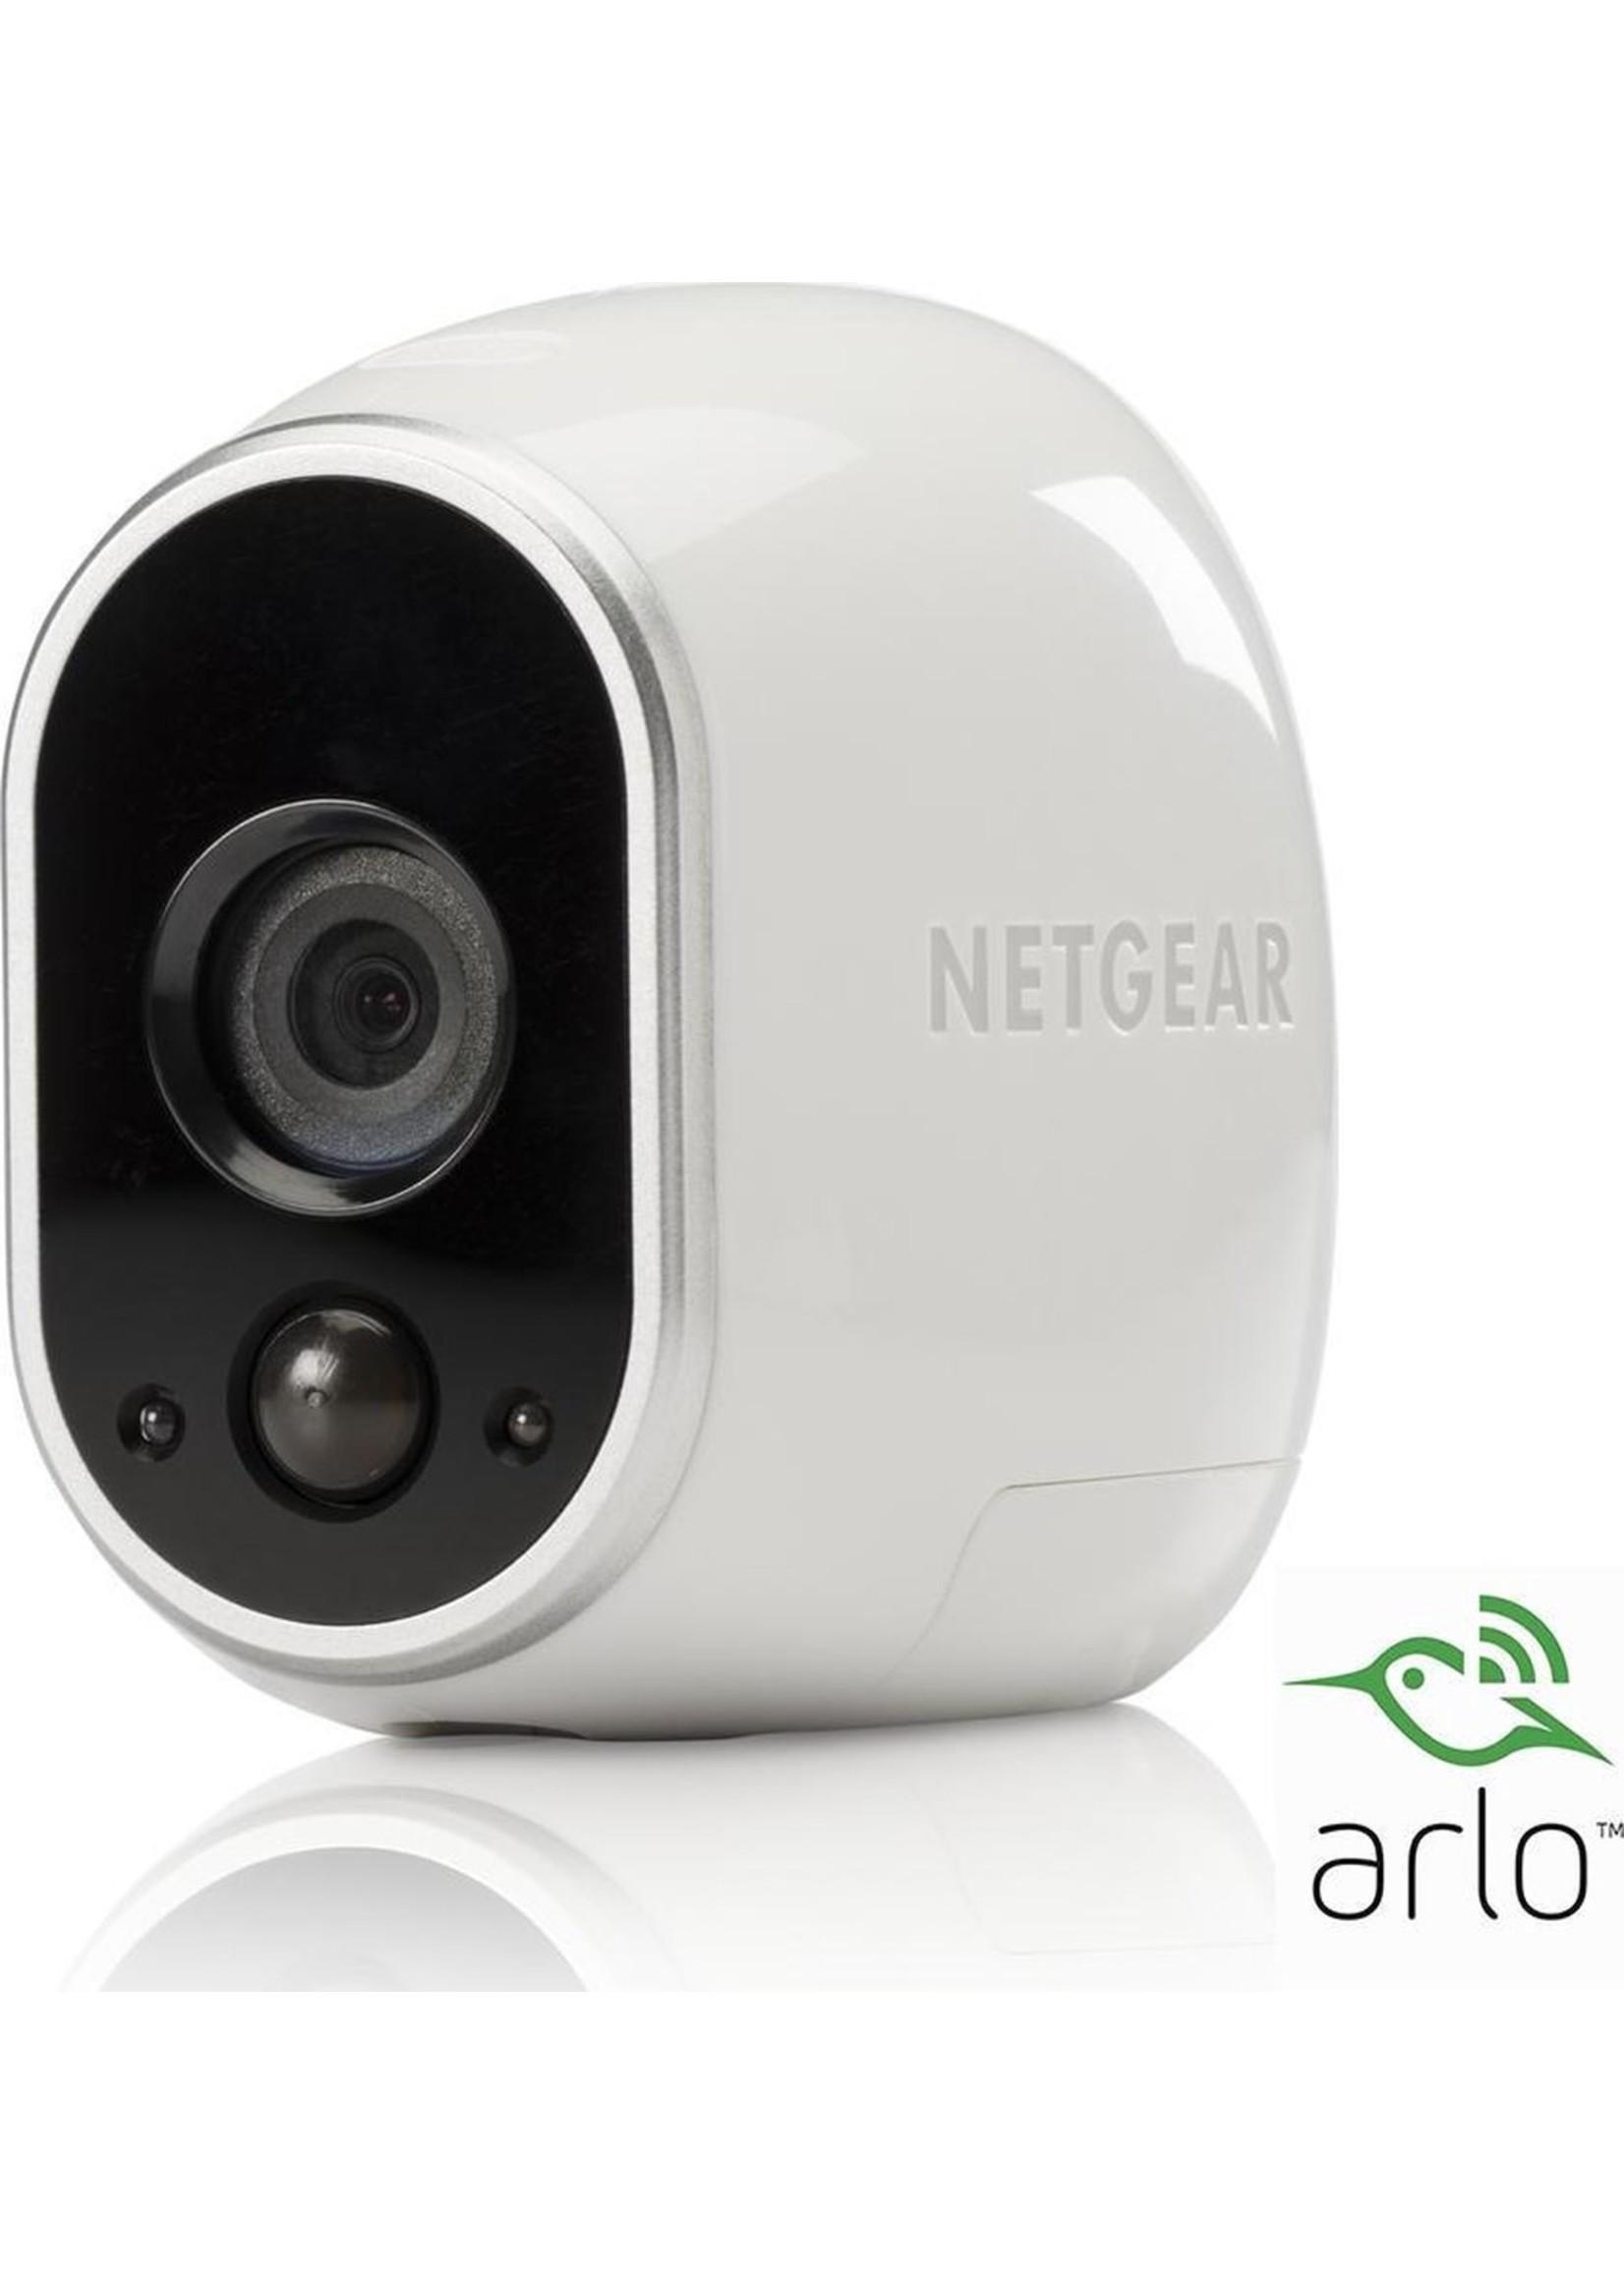 Arlo Arlo Pro - IP-Camera / beveiligingscamera - Uitbreiding koopjeshoek